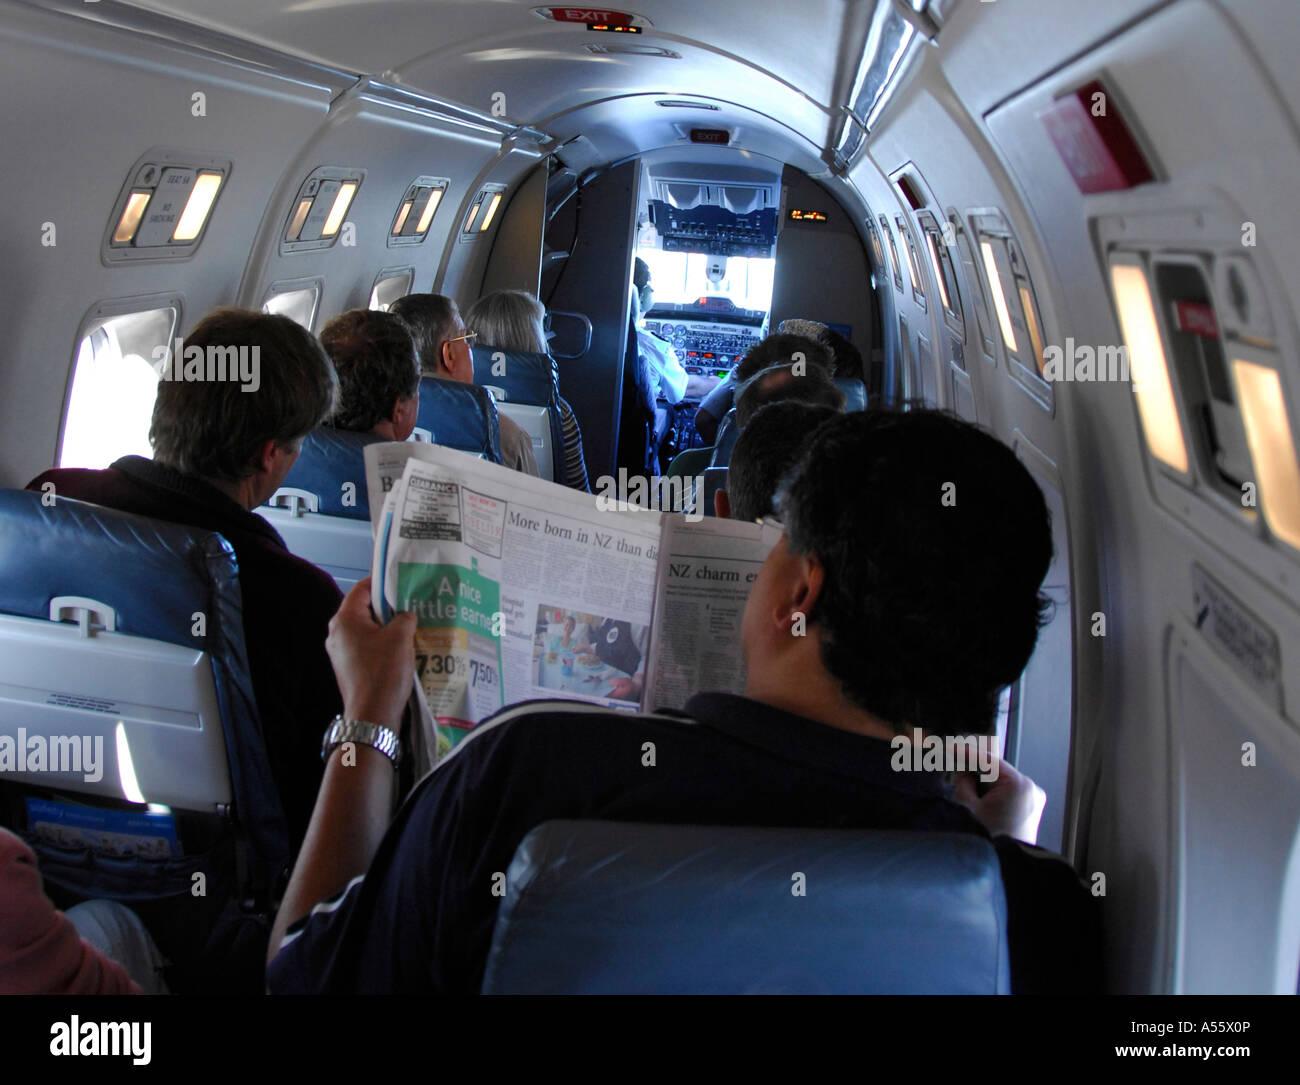 Airline passengers on Air New Zealand Beech1900D commuter aircraft during flight, February 2007 - Stock Image